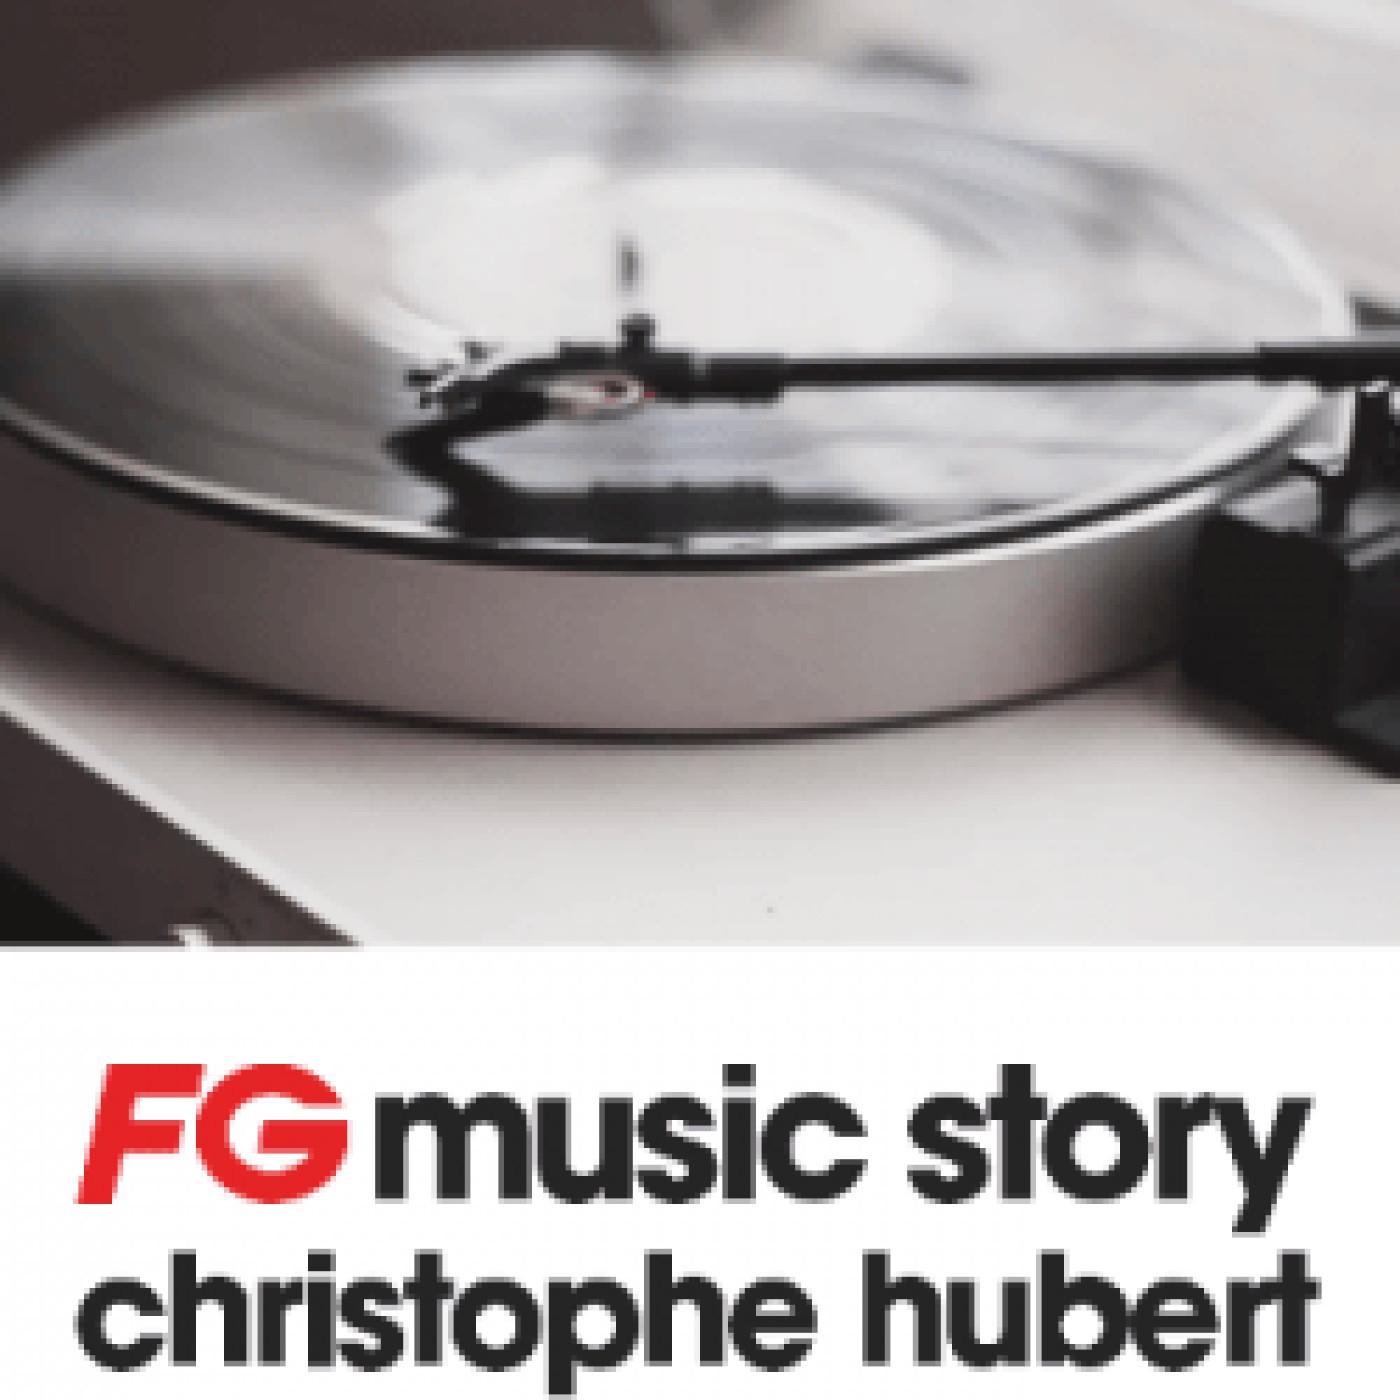 FG MUSIC STORY : SUPERFUNK